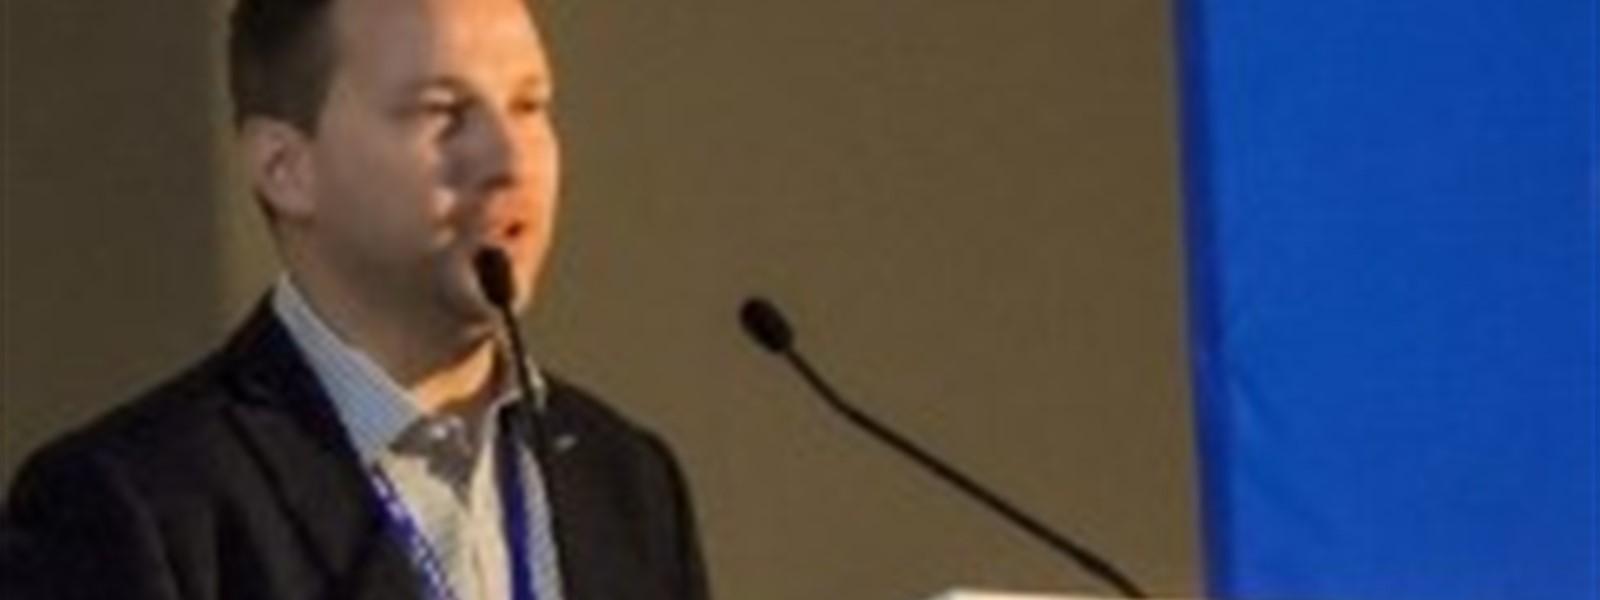 JJ Harvey from Reef-World giving a keynote speech in Bangladesh.